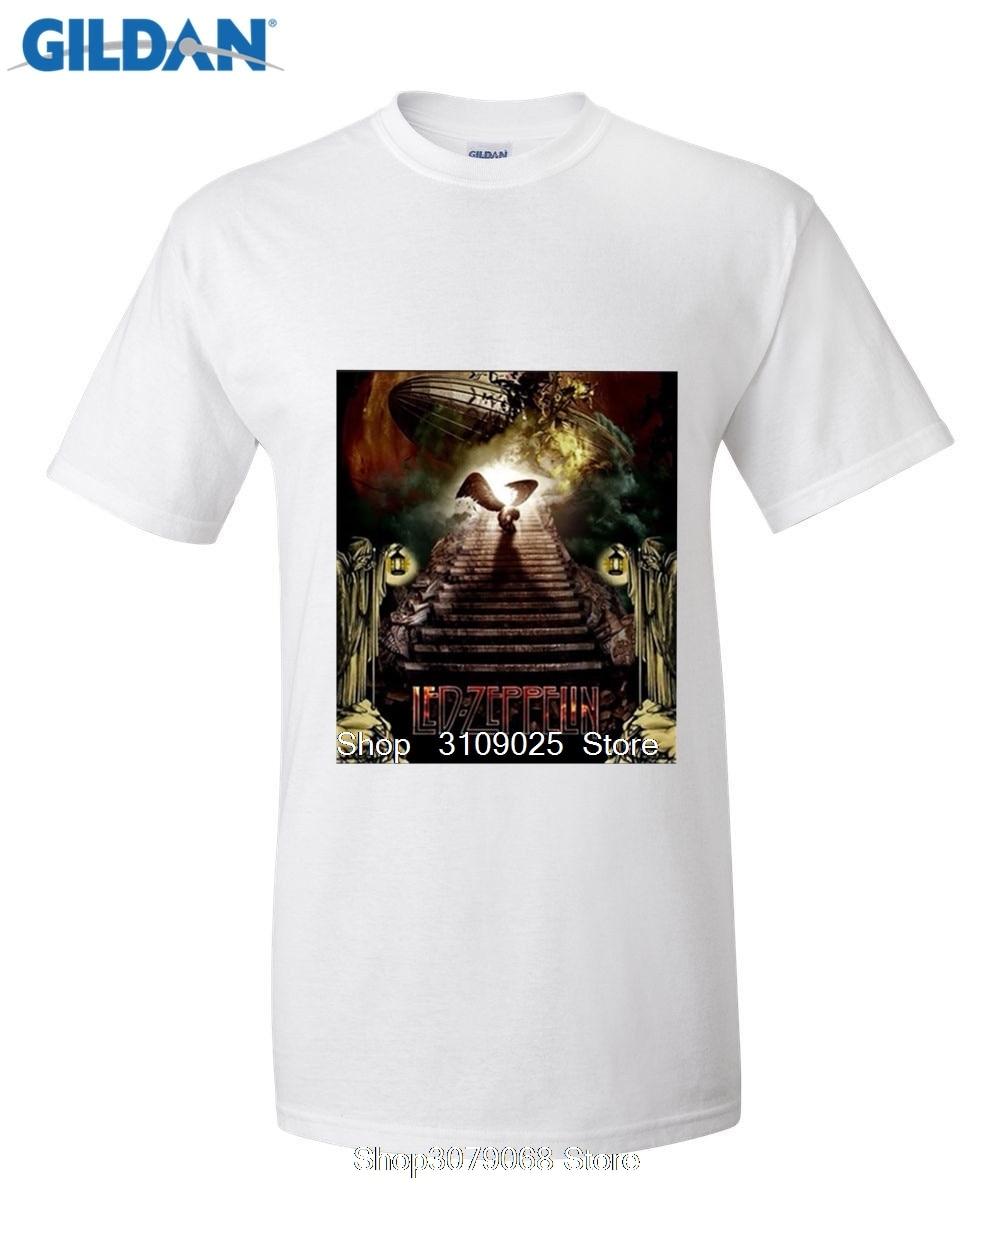 Design t shirt china - Gildan Design Your Own Led Zeppelin T Shirt Men High Quality Cotton Tshirt Man Short Sleeve